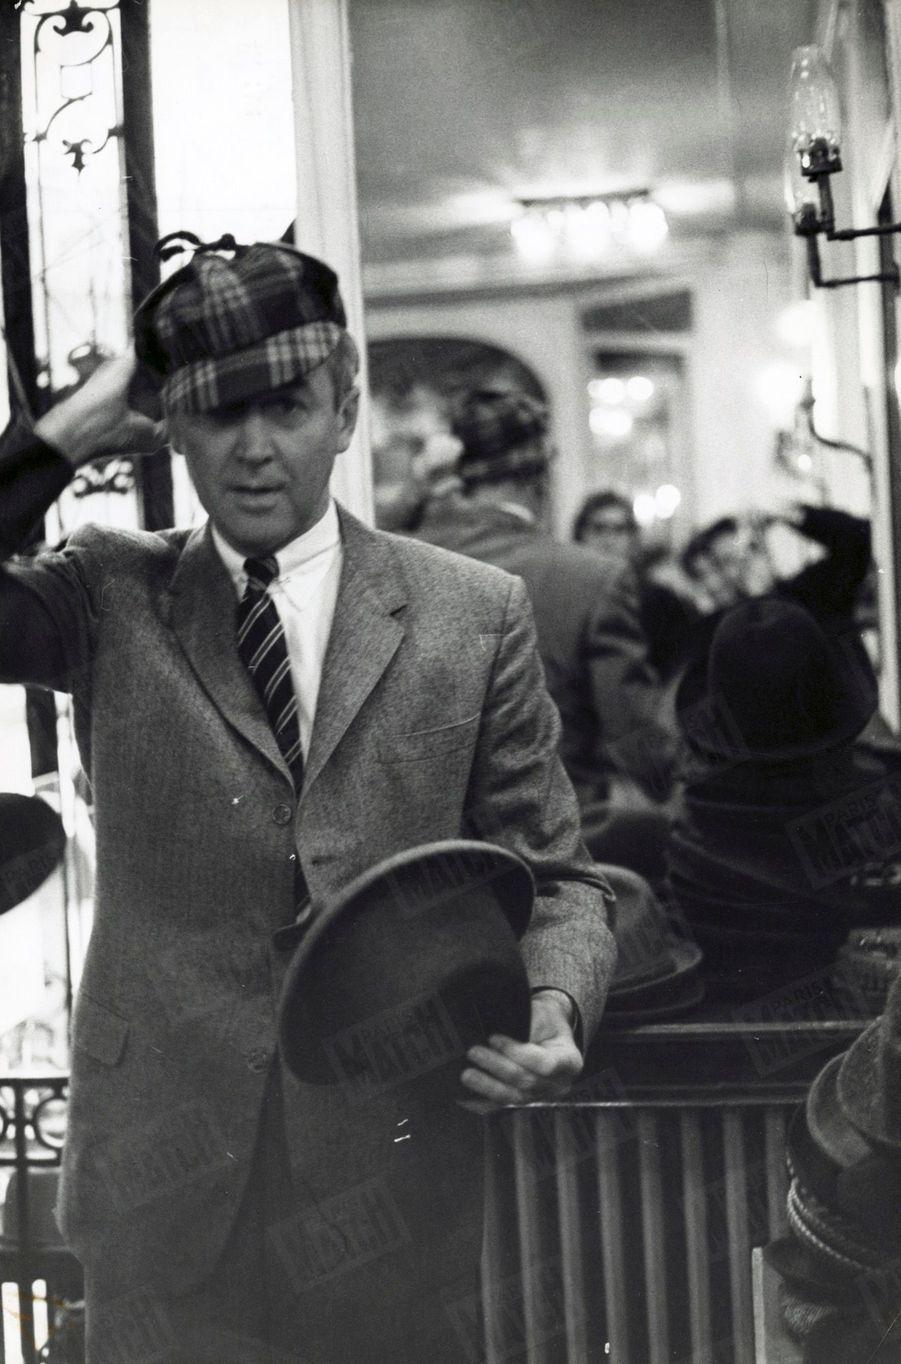 « James Stewart en Sherlock Holmes » - Paris Match n°553, daté du 14 novembre 1959.